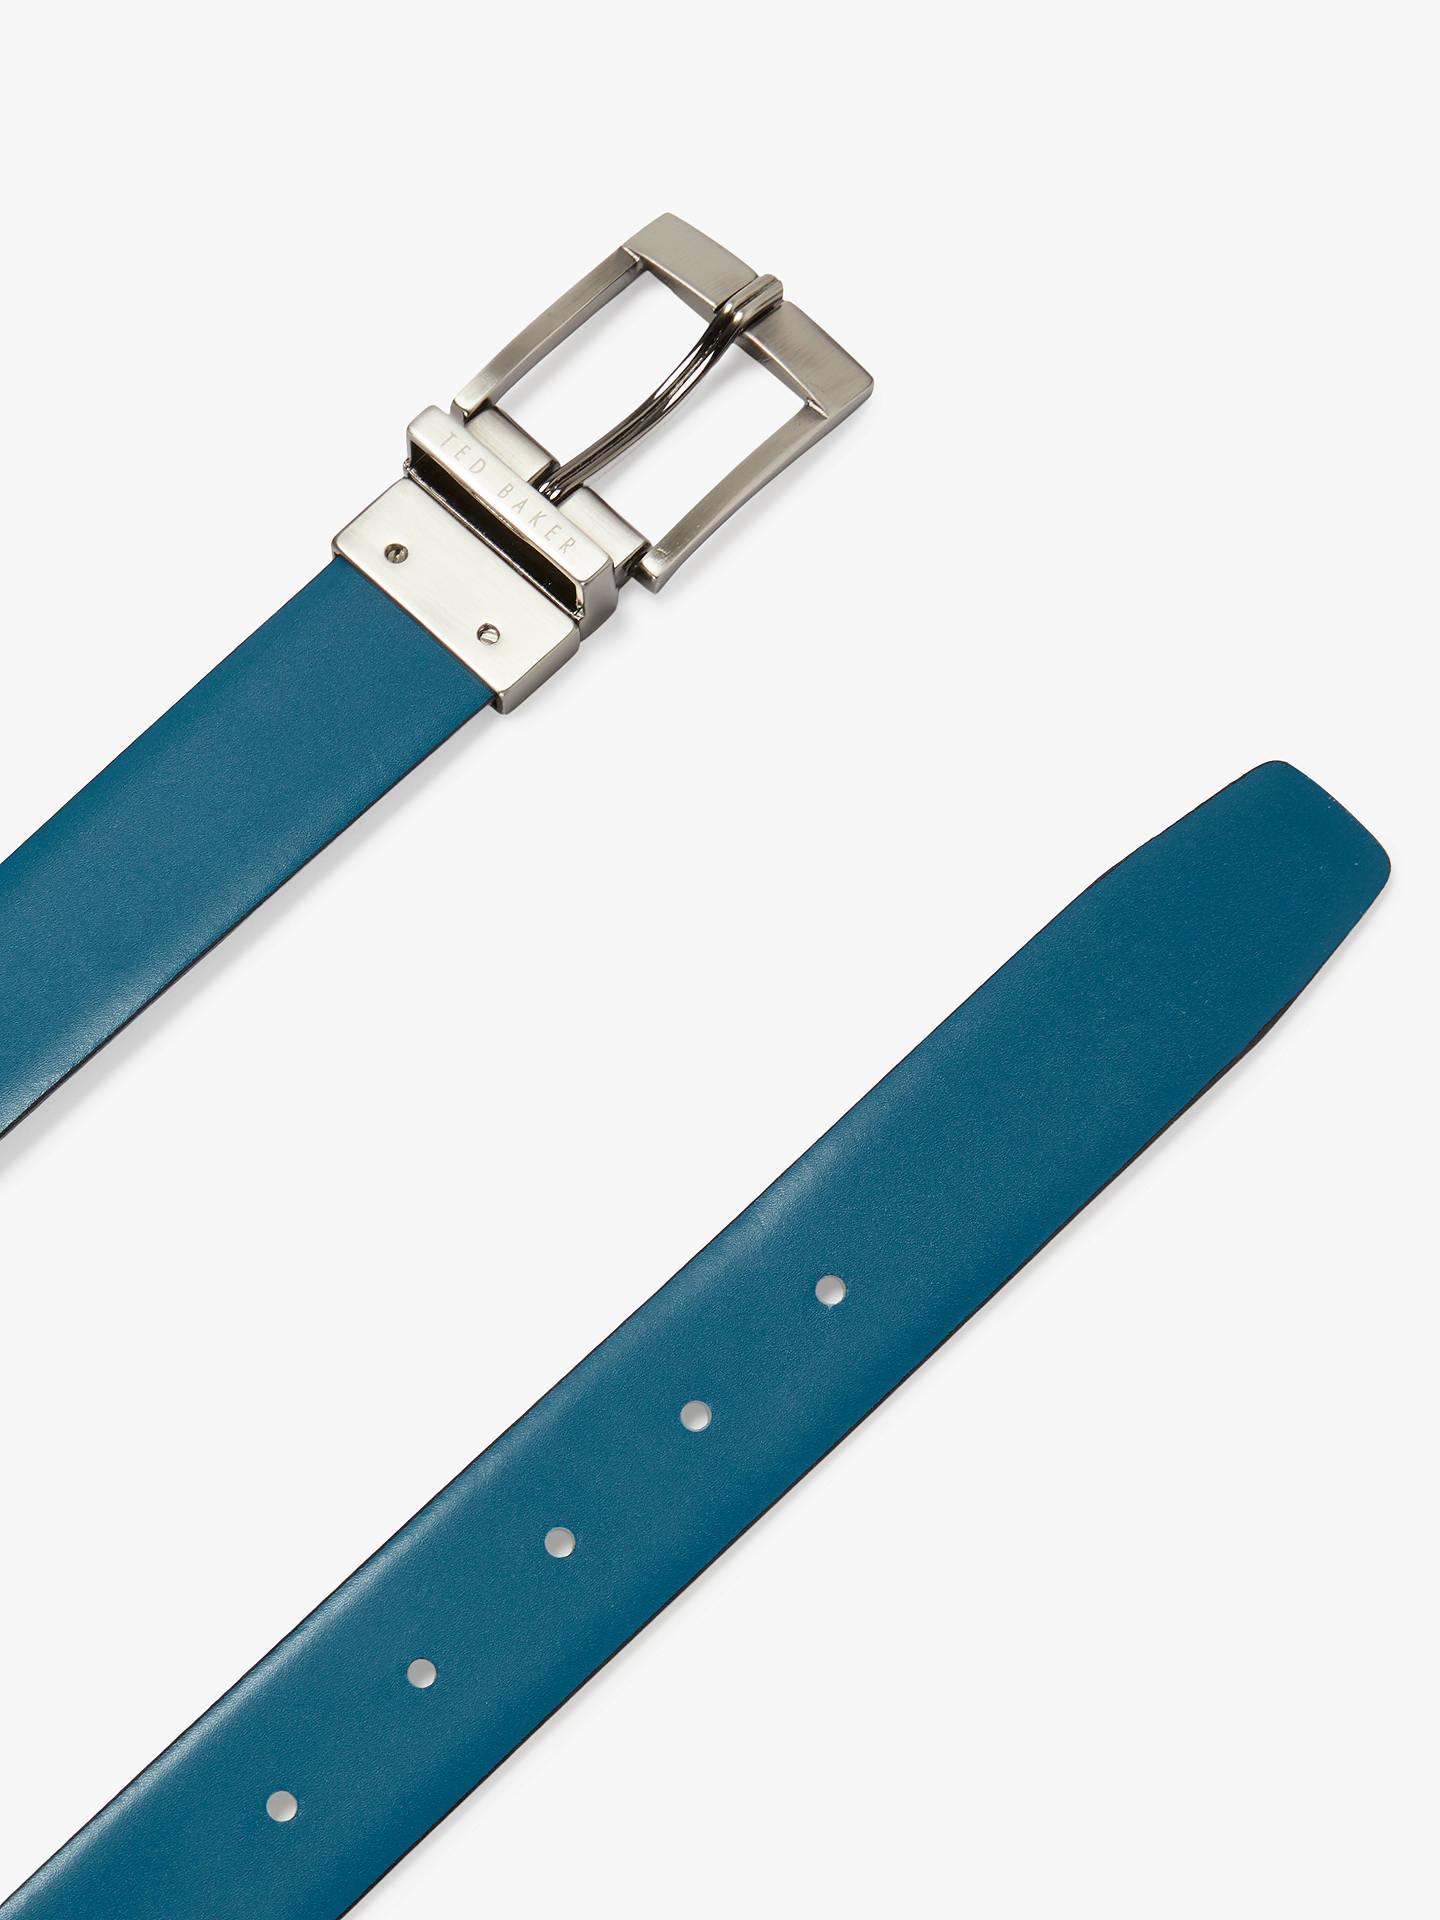 6f7514e12 ... Buy Ted Baker Longas Reversible Leather Belt